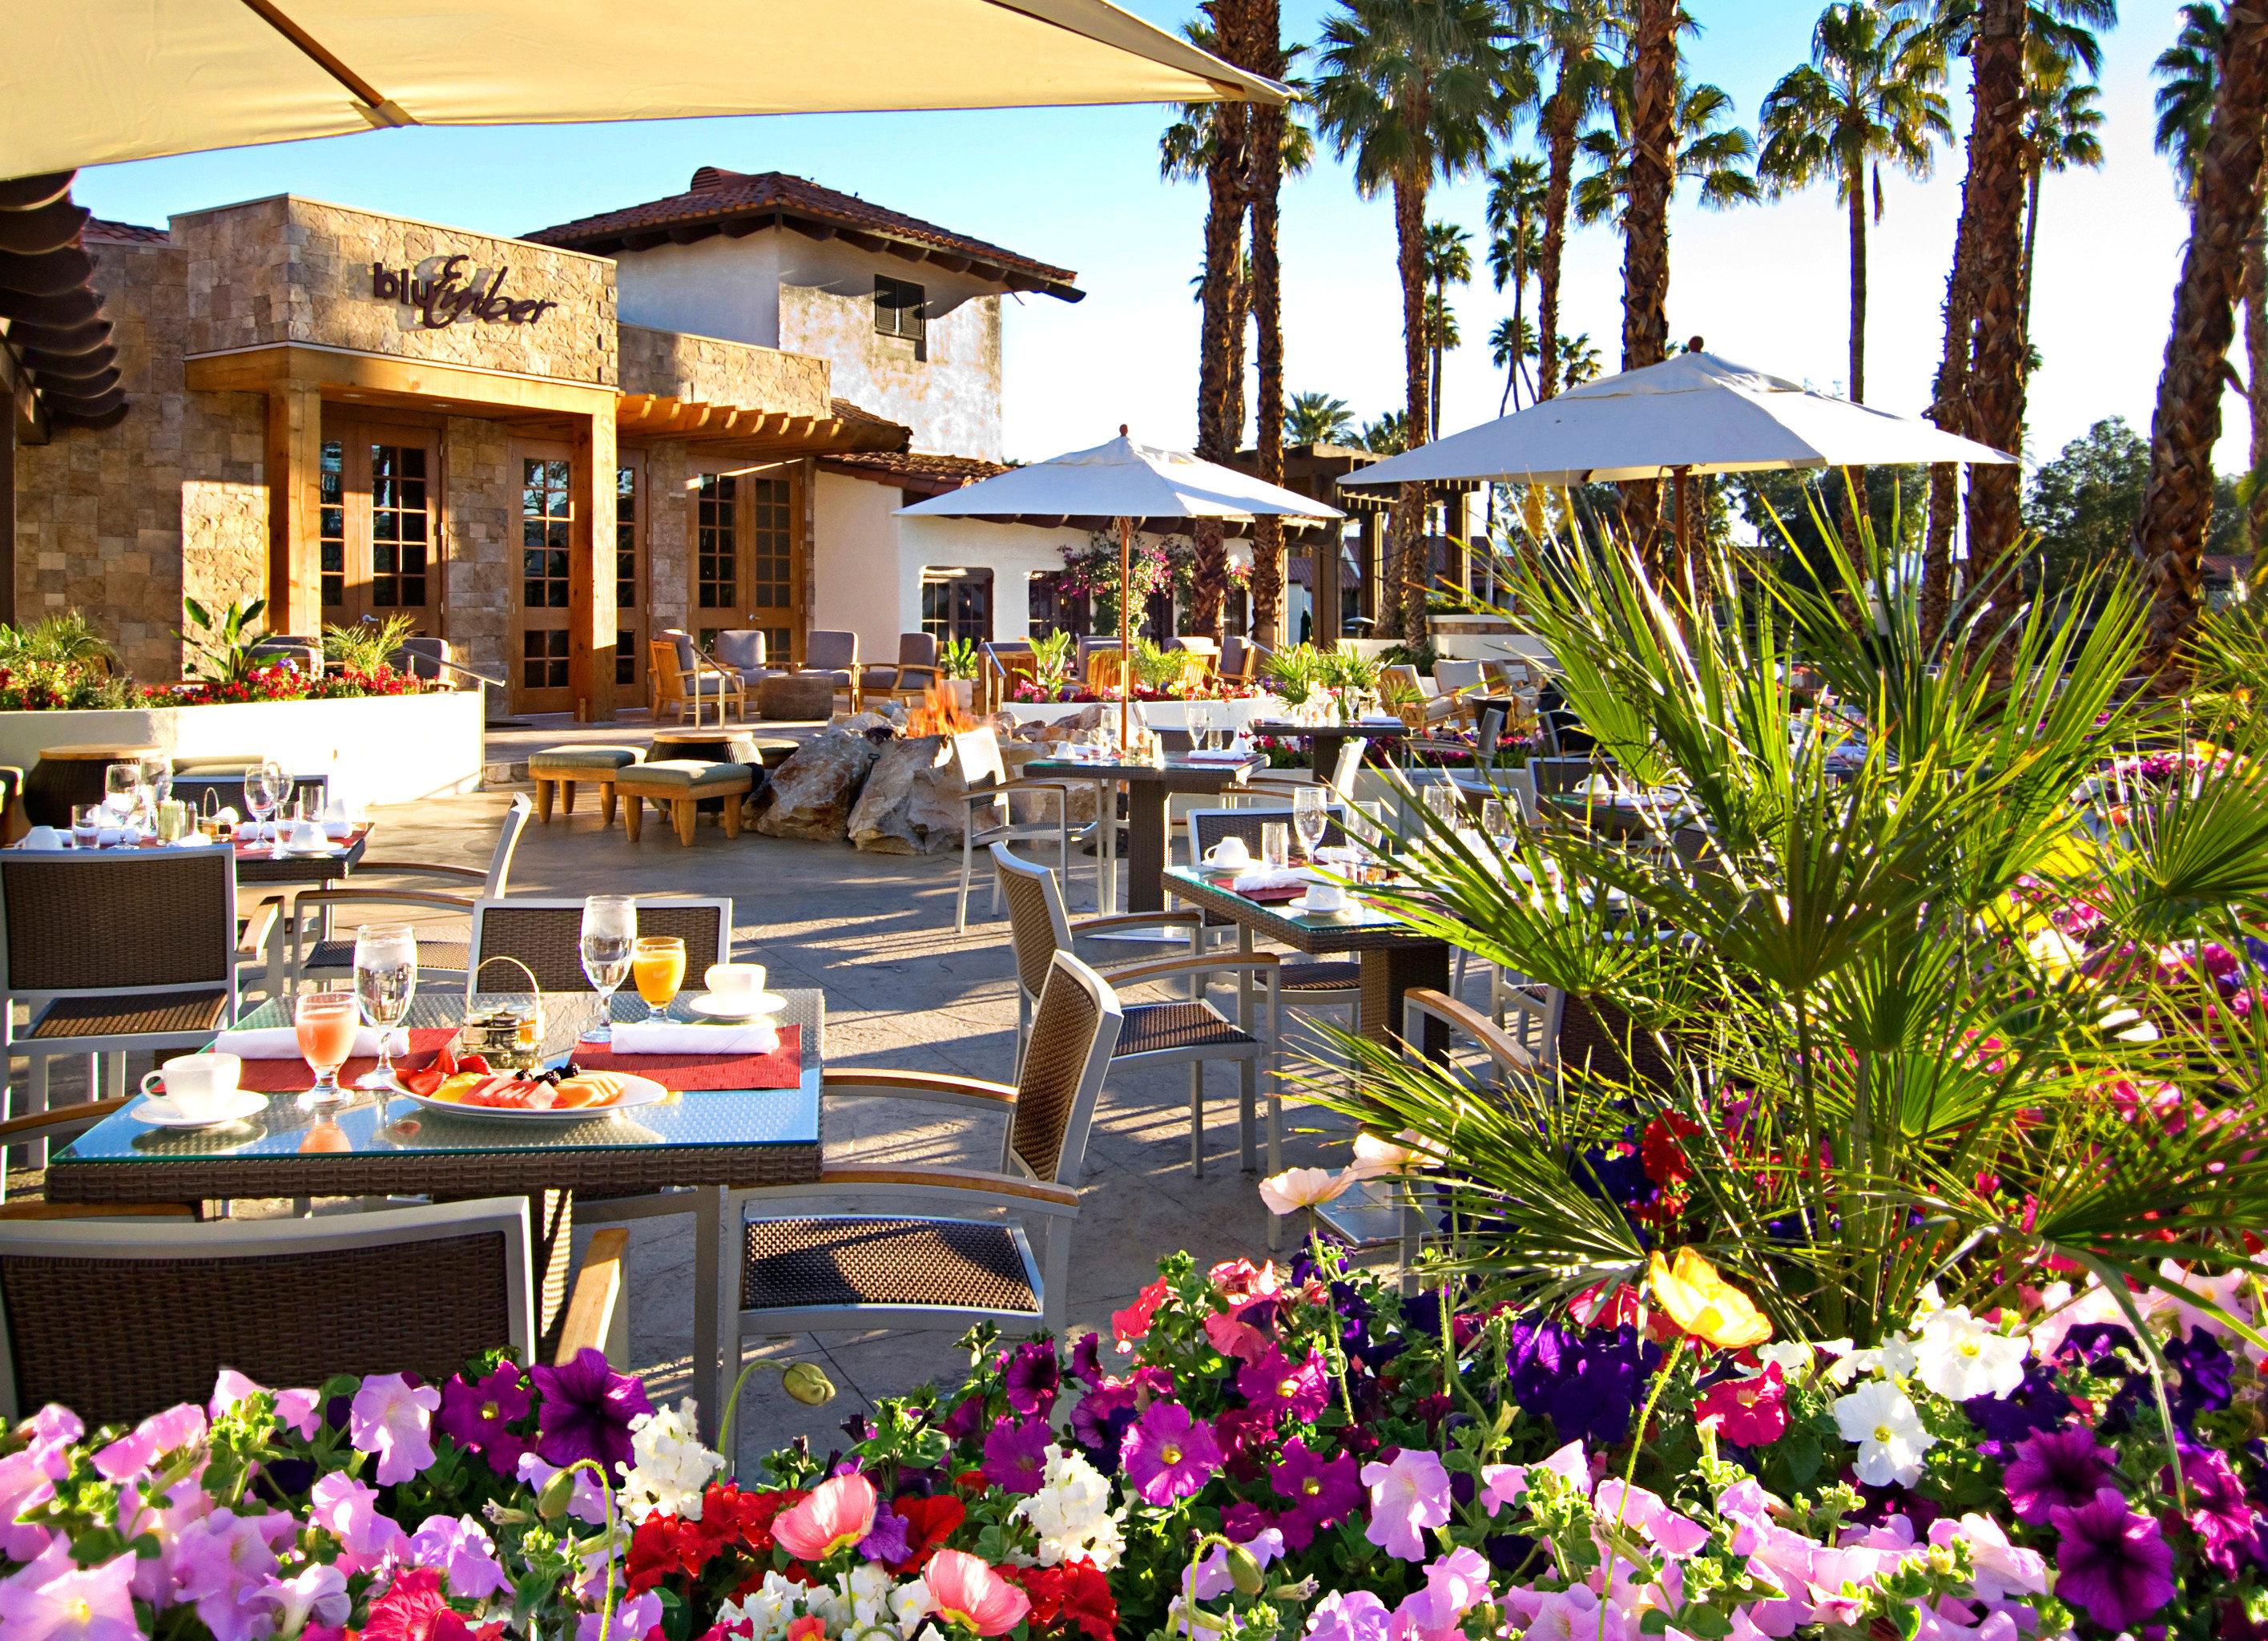 Bar Dining Drink Eat flower Resort floristry plant restaurant colorful Garden surrounded